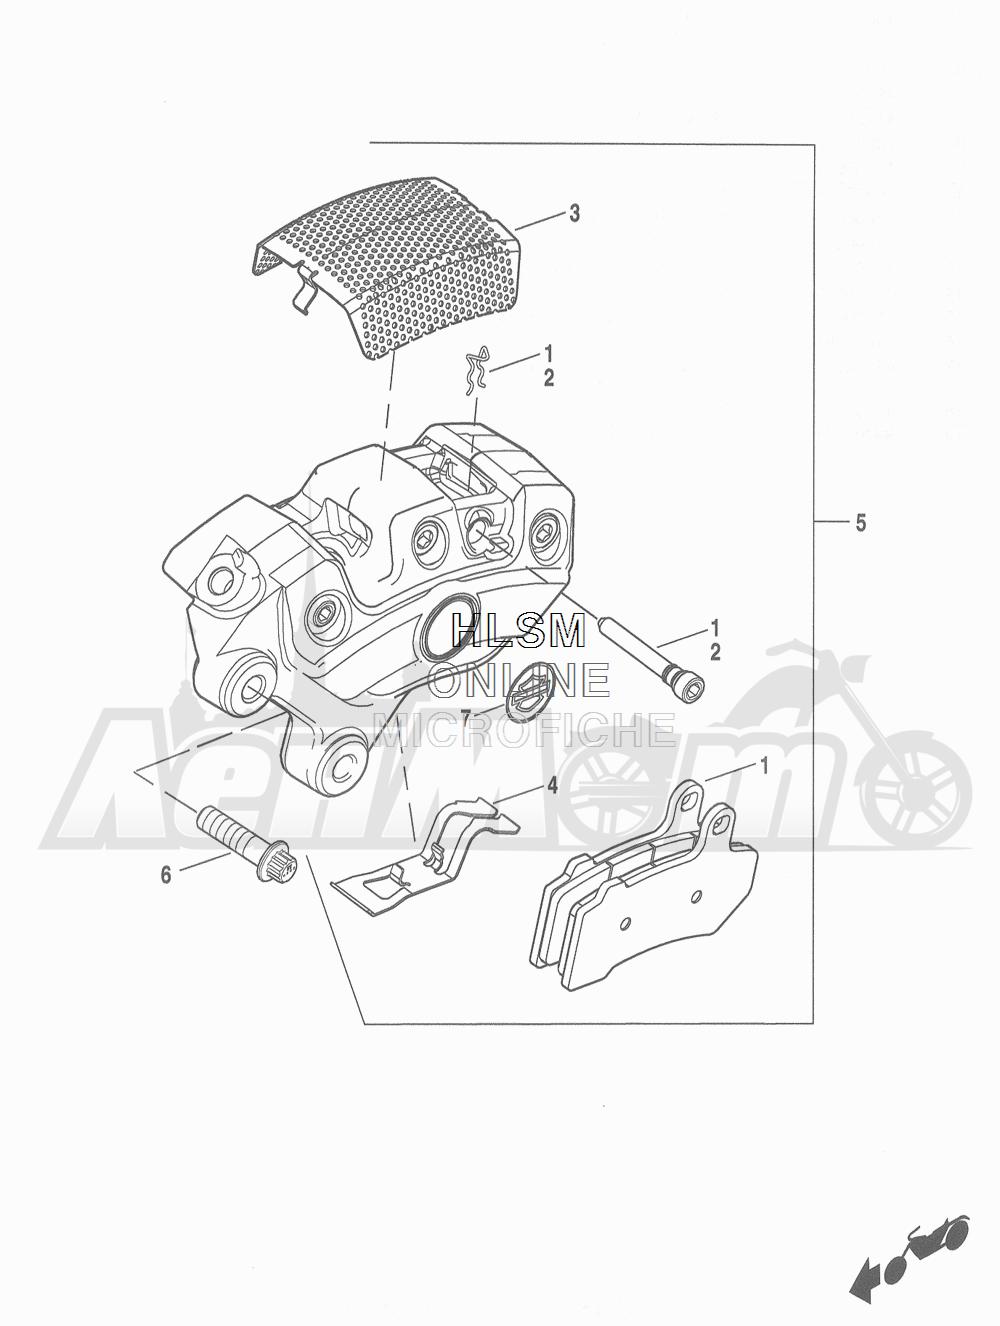 Запчасти для Мотоцикла Harley-Davidson 2016 FLHTCU 103 ULTRA CLASSIC ELECTRAGLIDE (FCM) Раздел: BRAKE - FRONT BRAKE CALIPER ASSEMBLY | передний тормоз тормозной суппорт в сборе